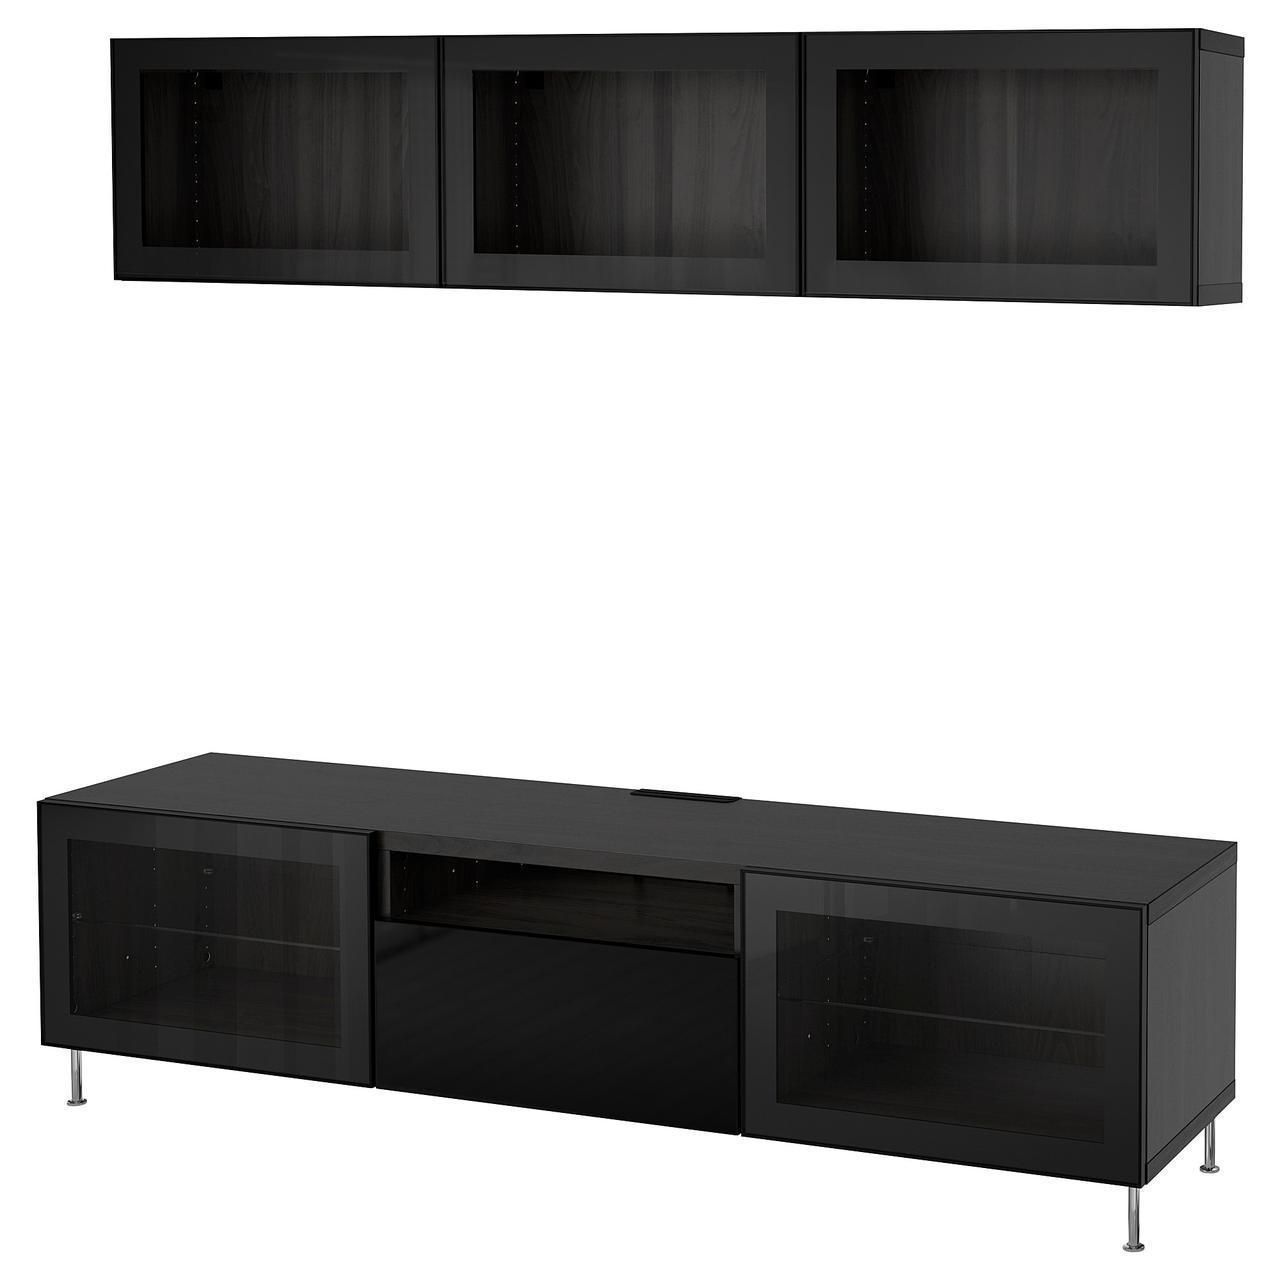 IKEA BESTA Тумба под телевизор с стеклянными дверьми  (592.676.10)